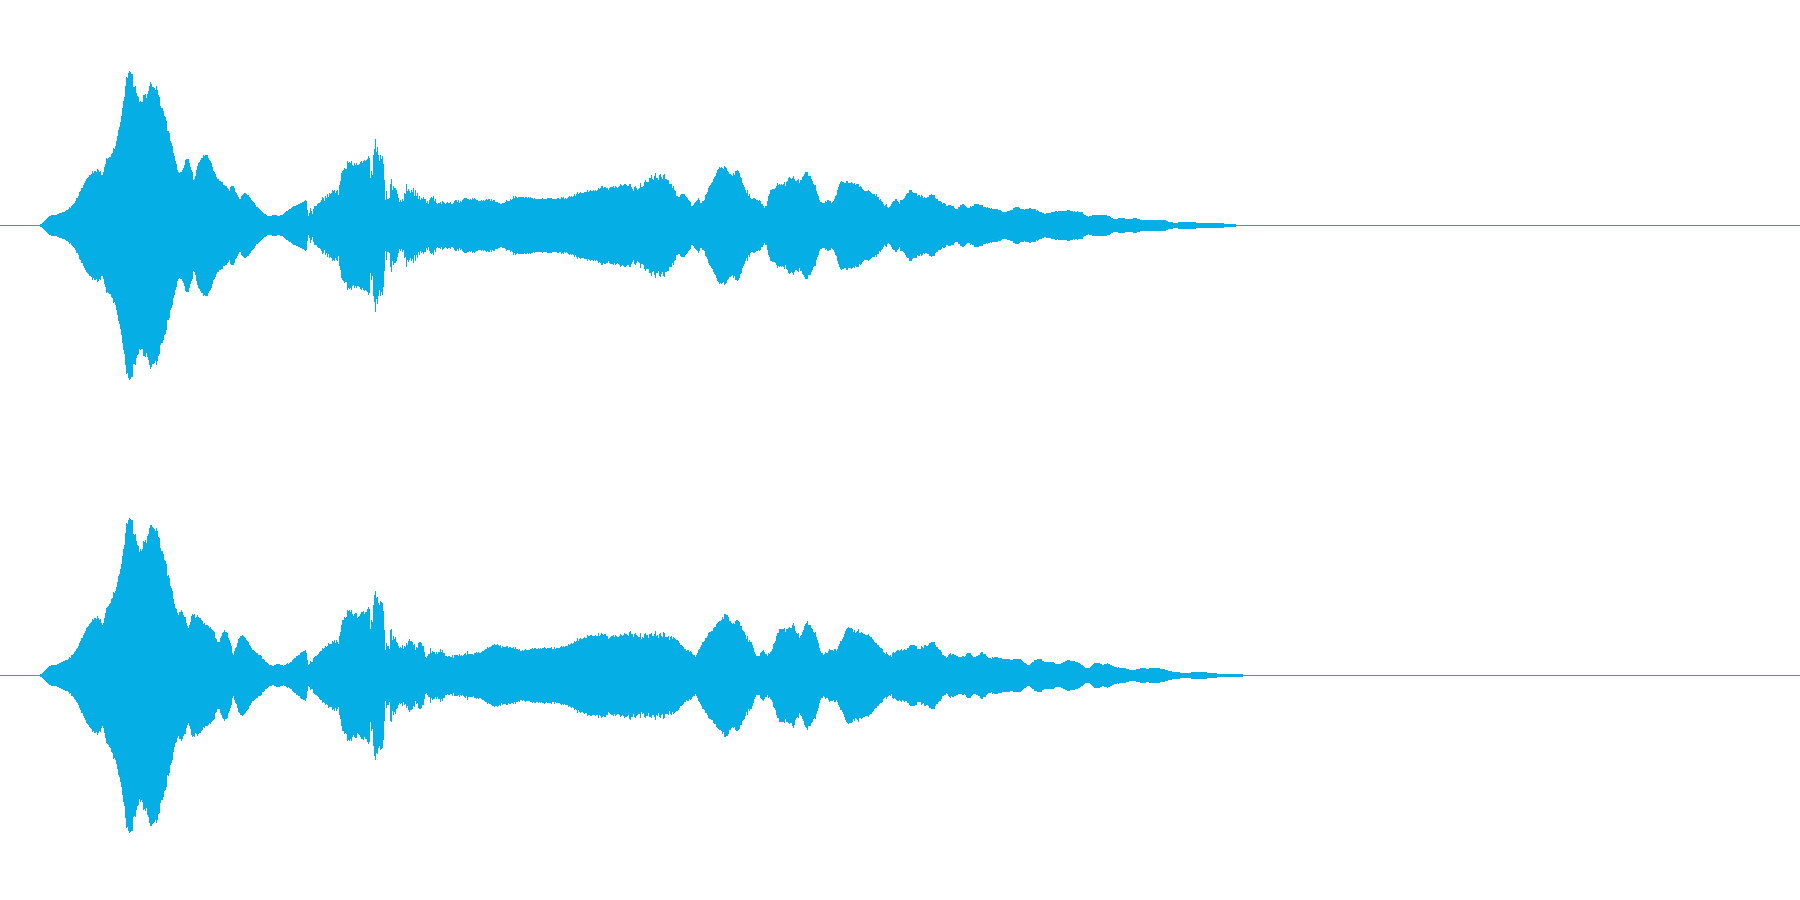 尺八 生演奏 古典風 残響音有 #17の再生済みの波形